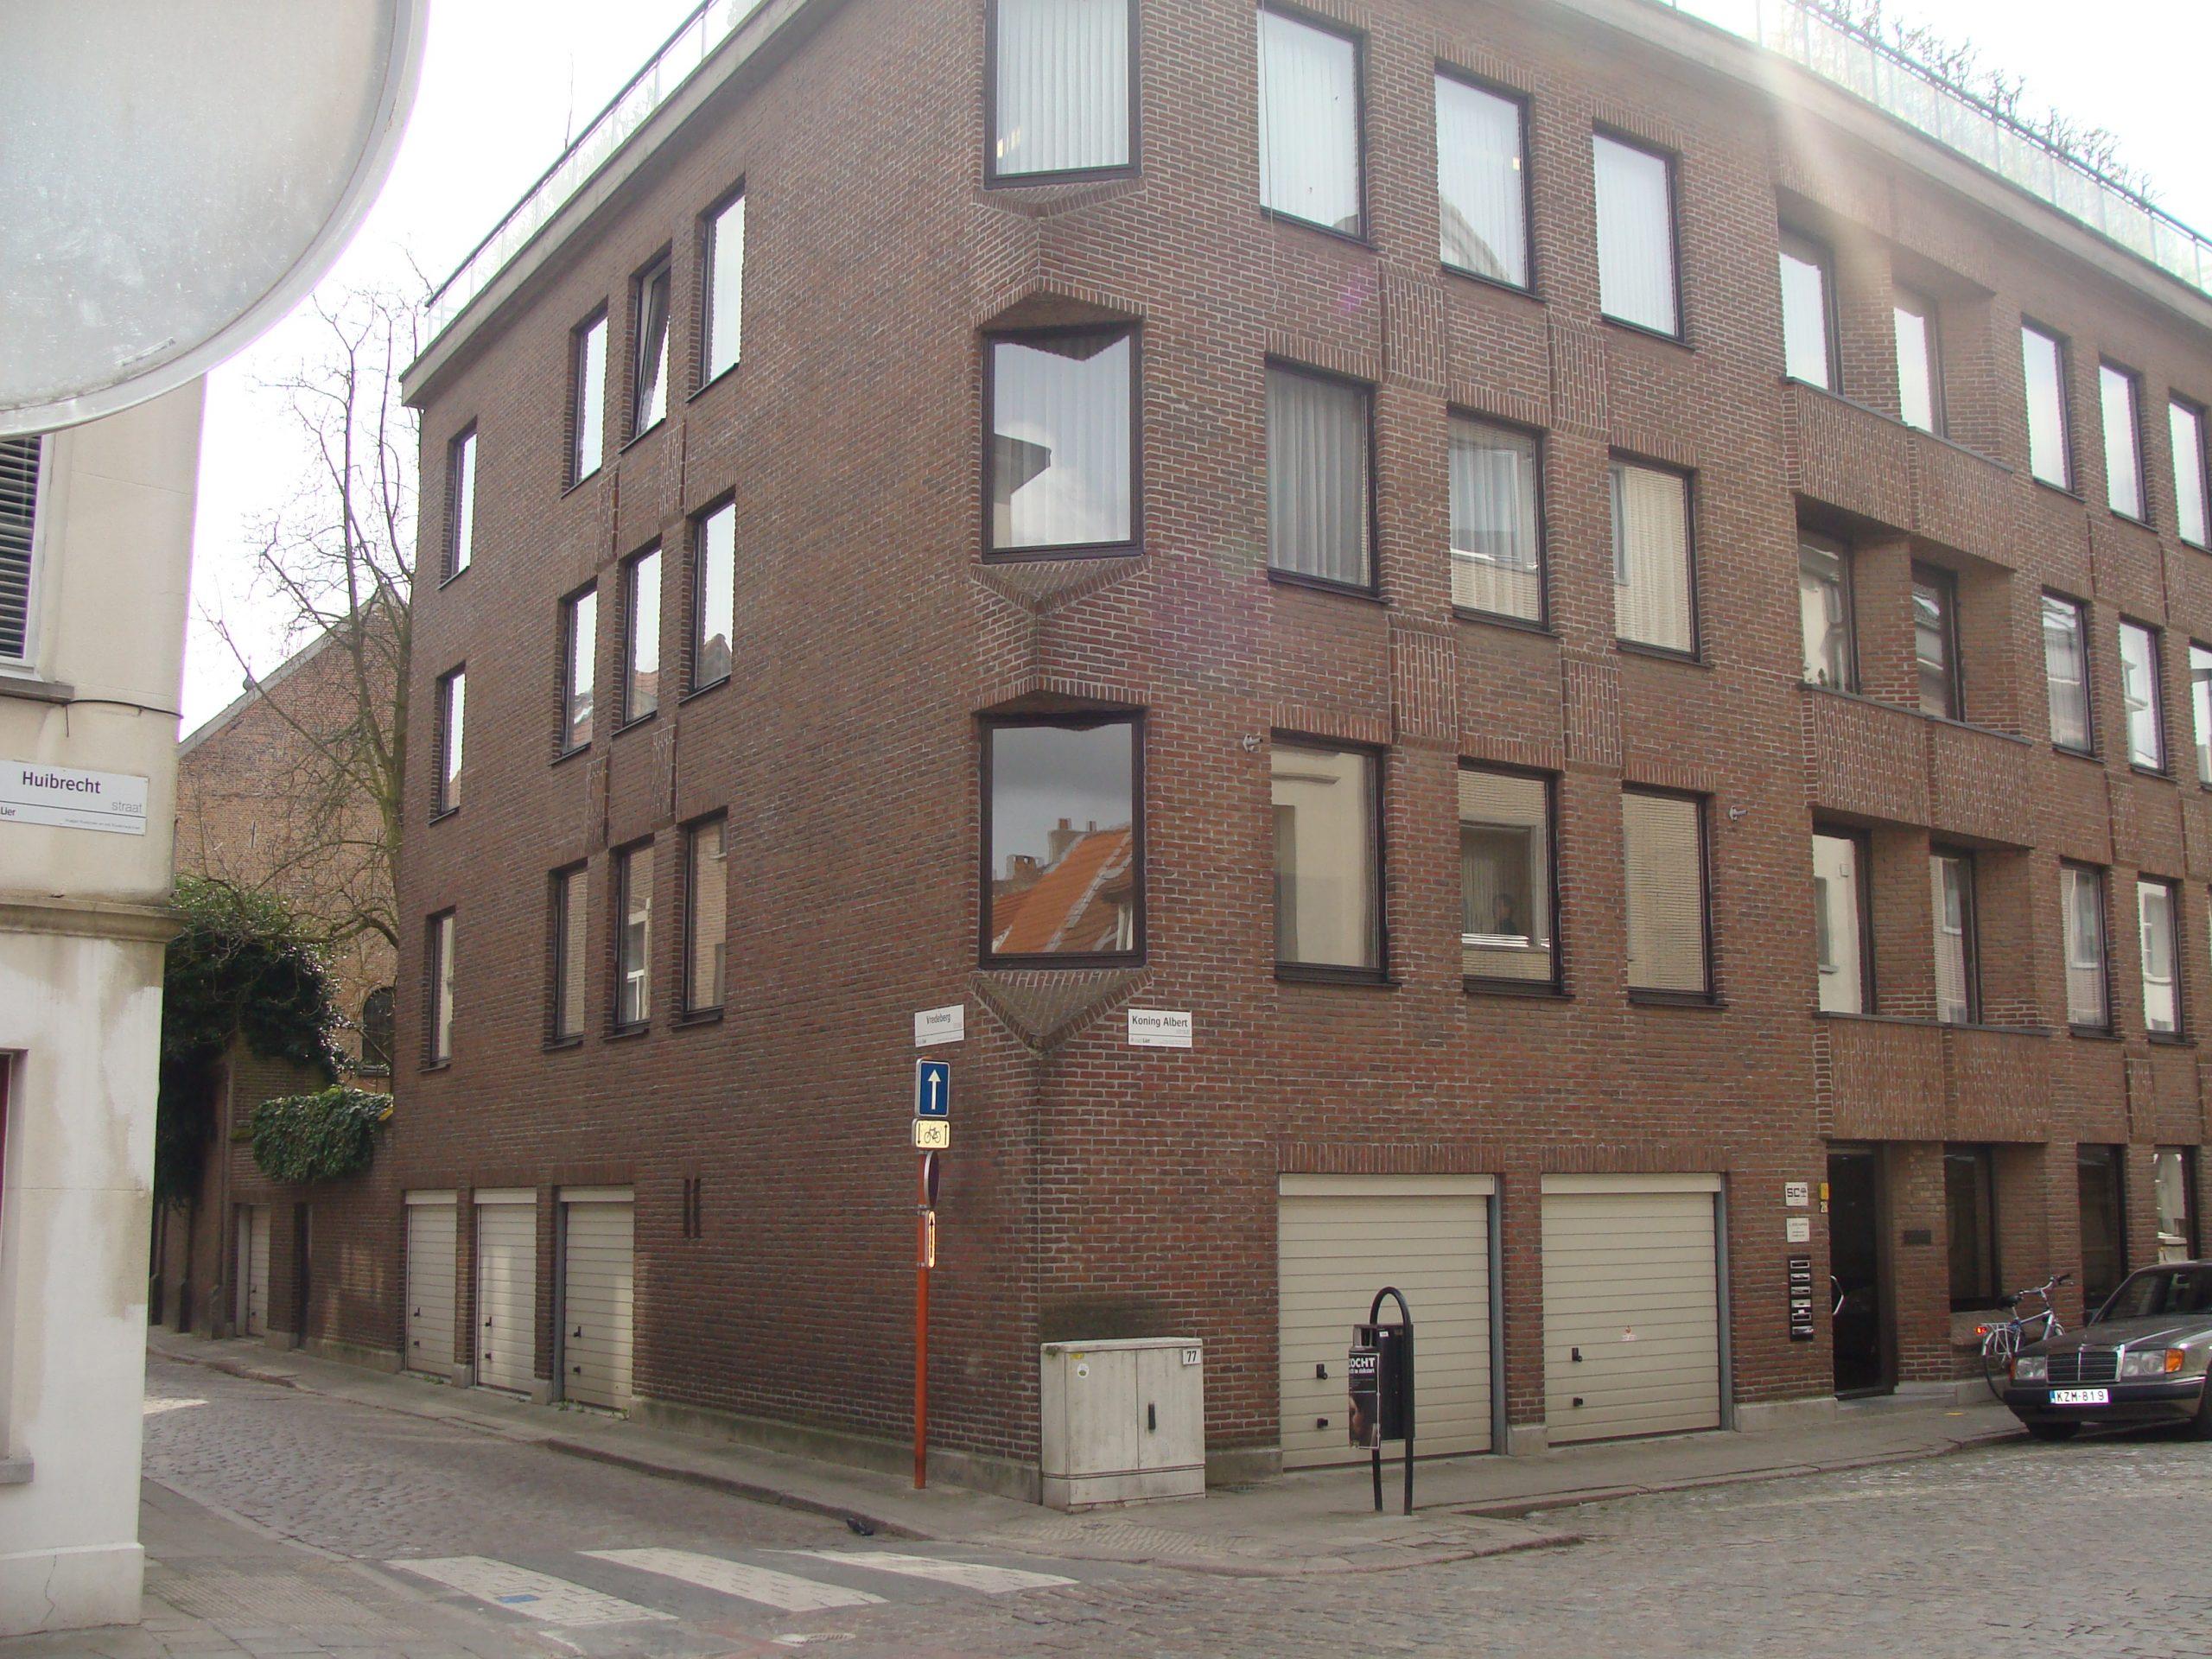 Appartement met 3 slpkr + terras + inpandige autostpl in hartje centrum Lier.